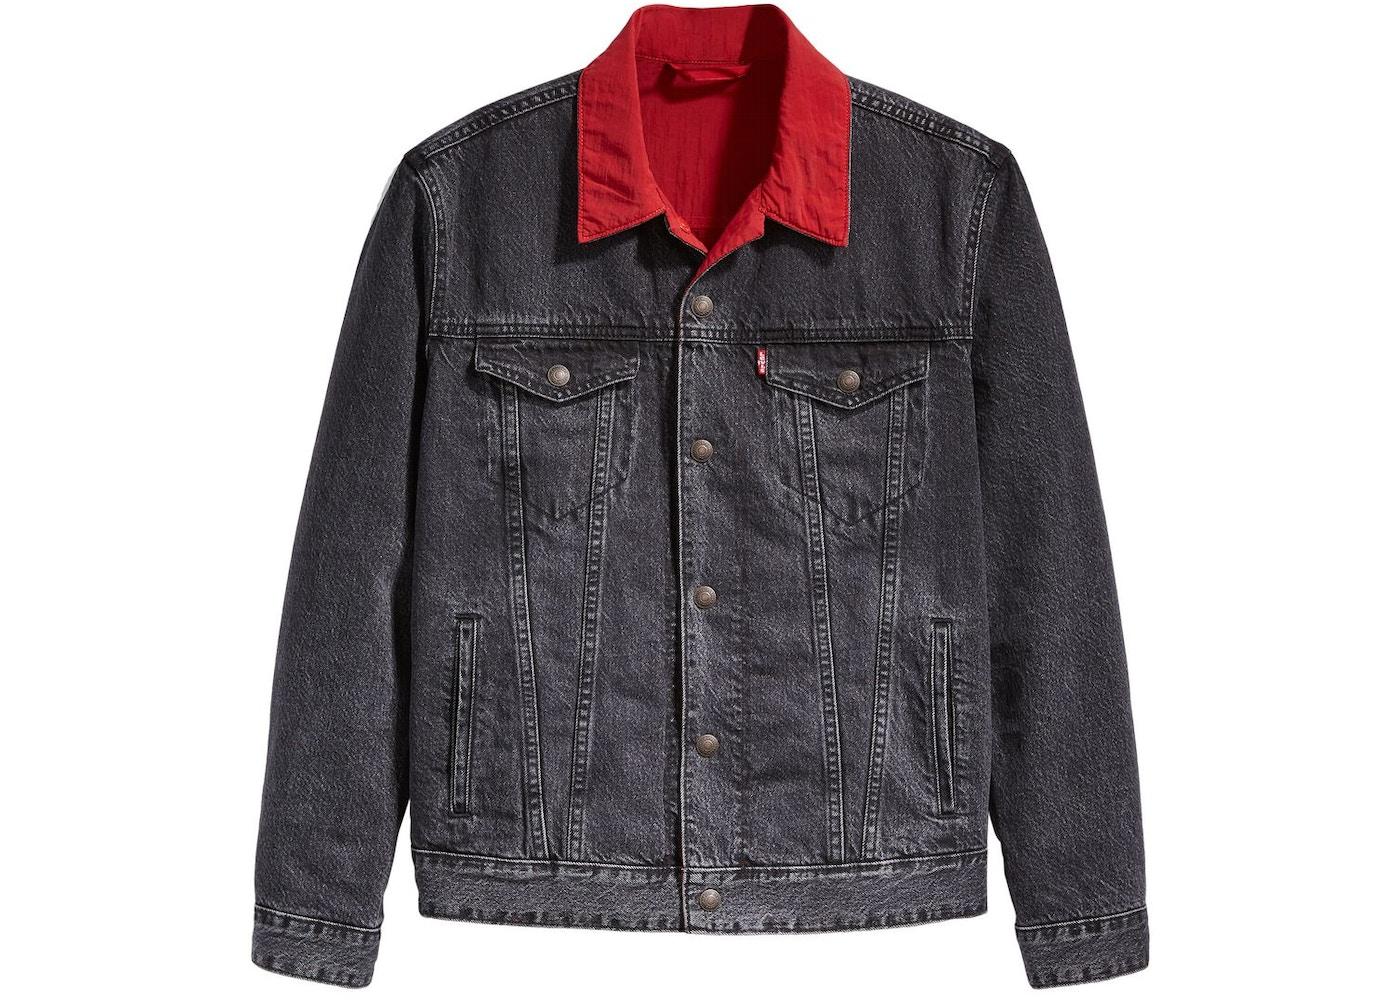 7642b536719a84 Other Brands Jordan Apparel - Buy   Sell Streetwear